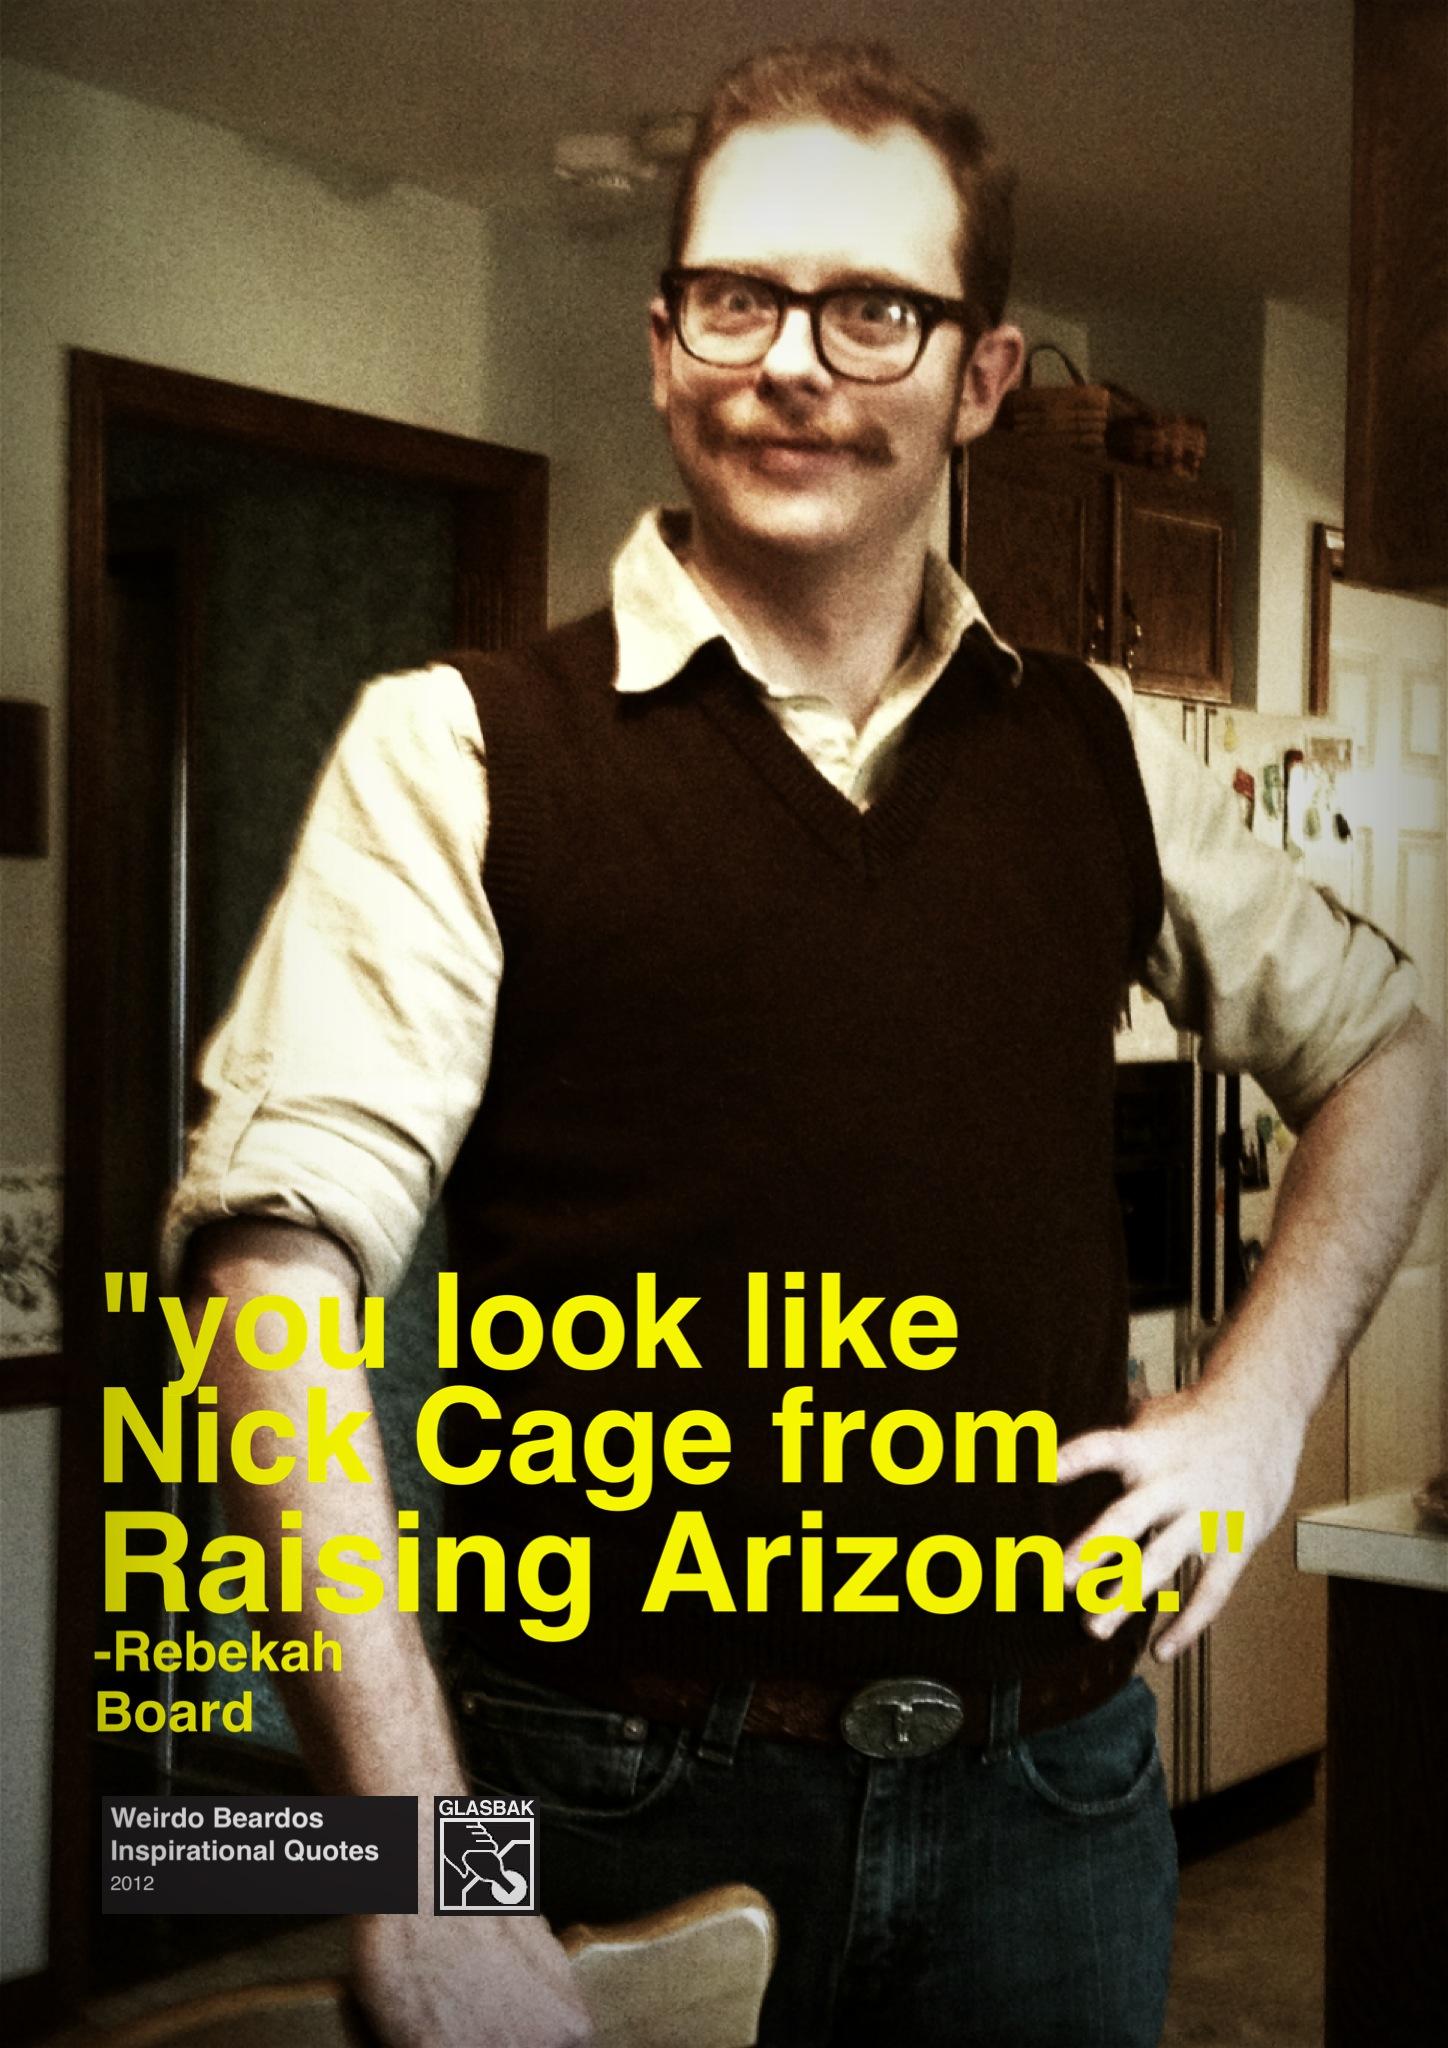 2012-11-18_You Look Like Nick Cage from Raising Arizona.jpg